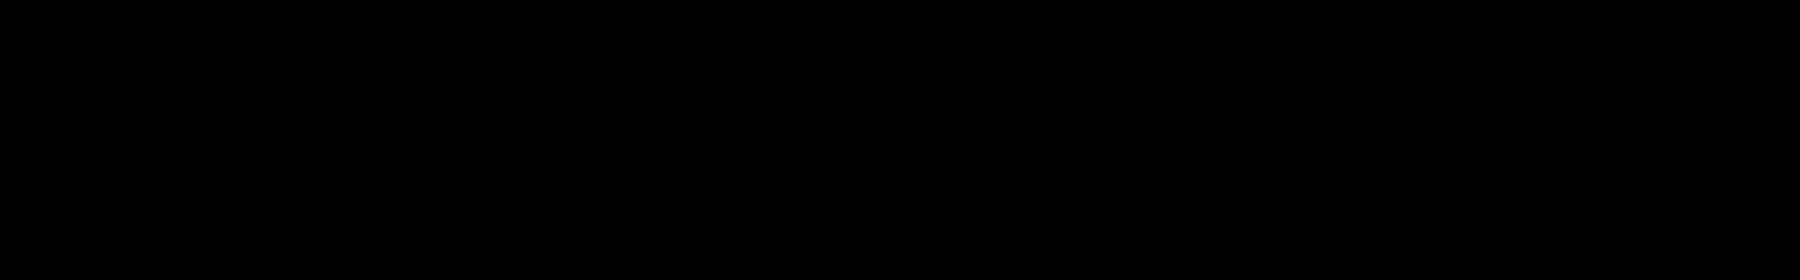 Glitch Universe audio waveform